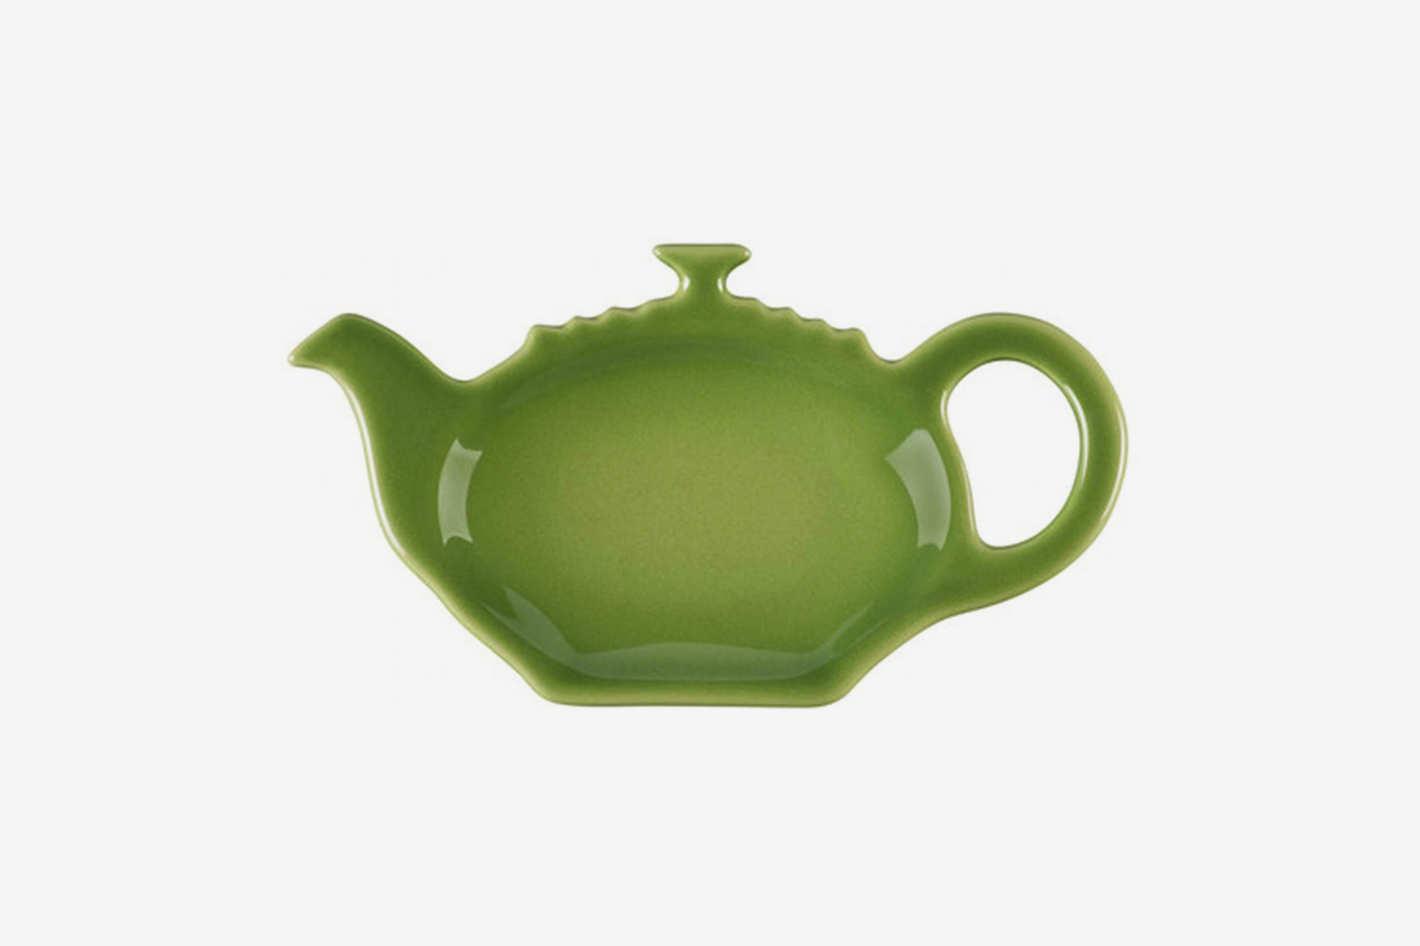 Le Creuset Stoneware Tea Bag Holder